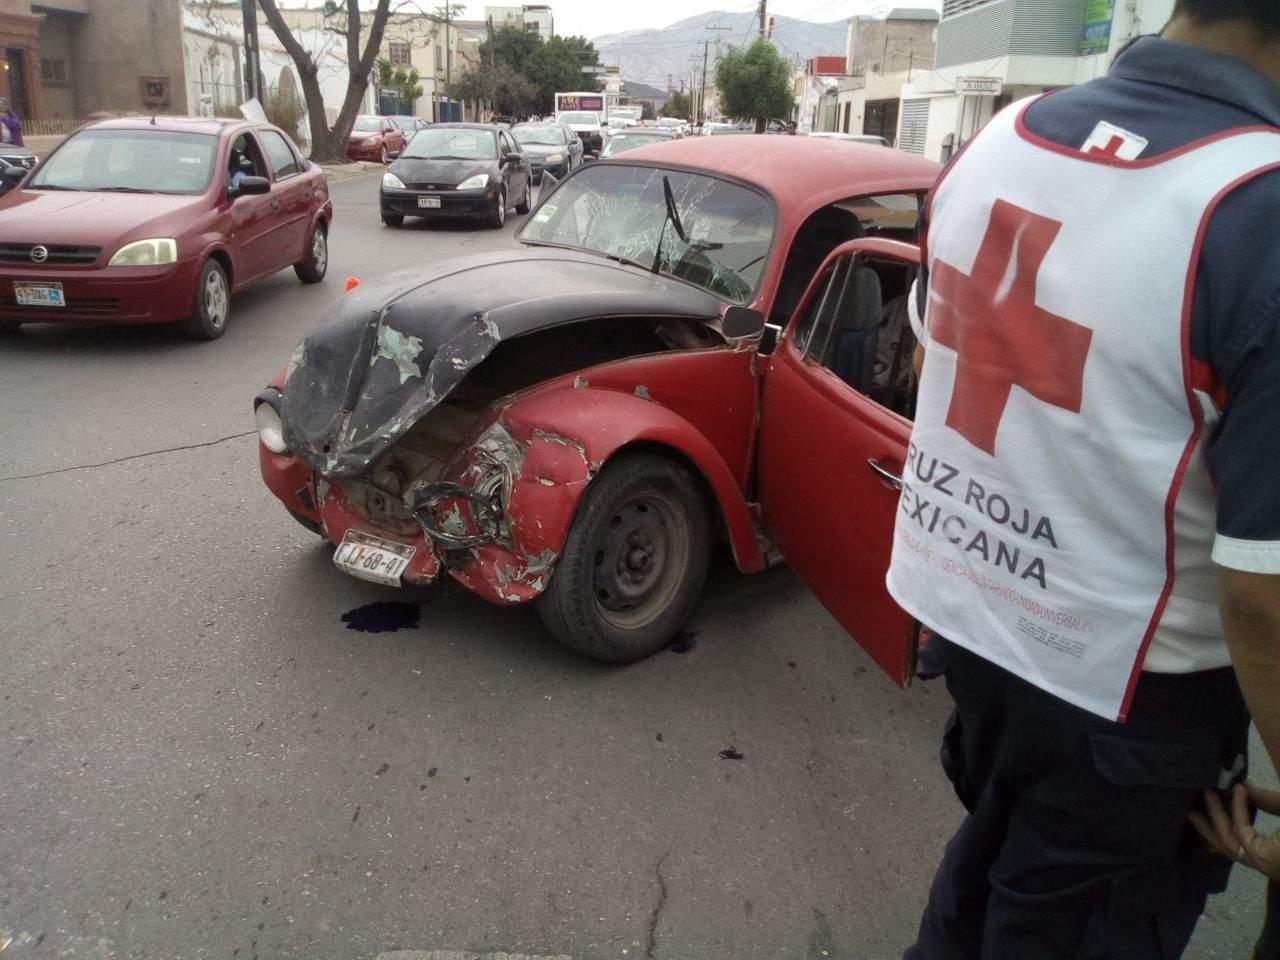 Mujer sale proyectada de un vehículo luego de choque